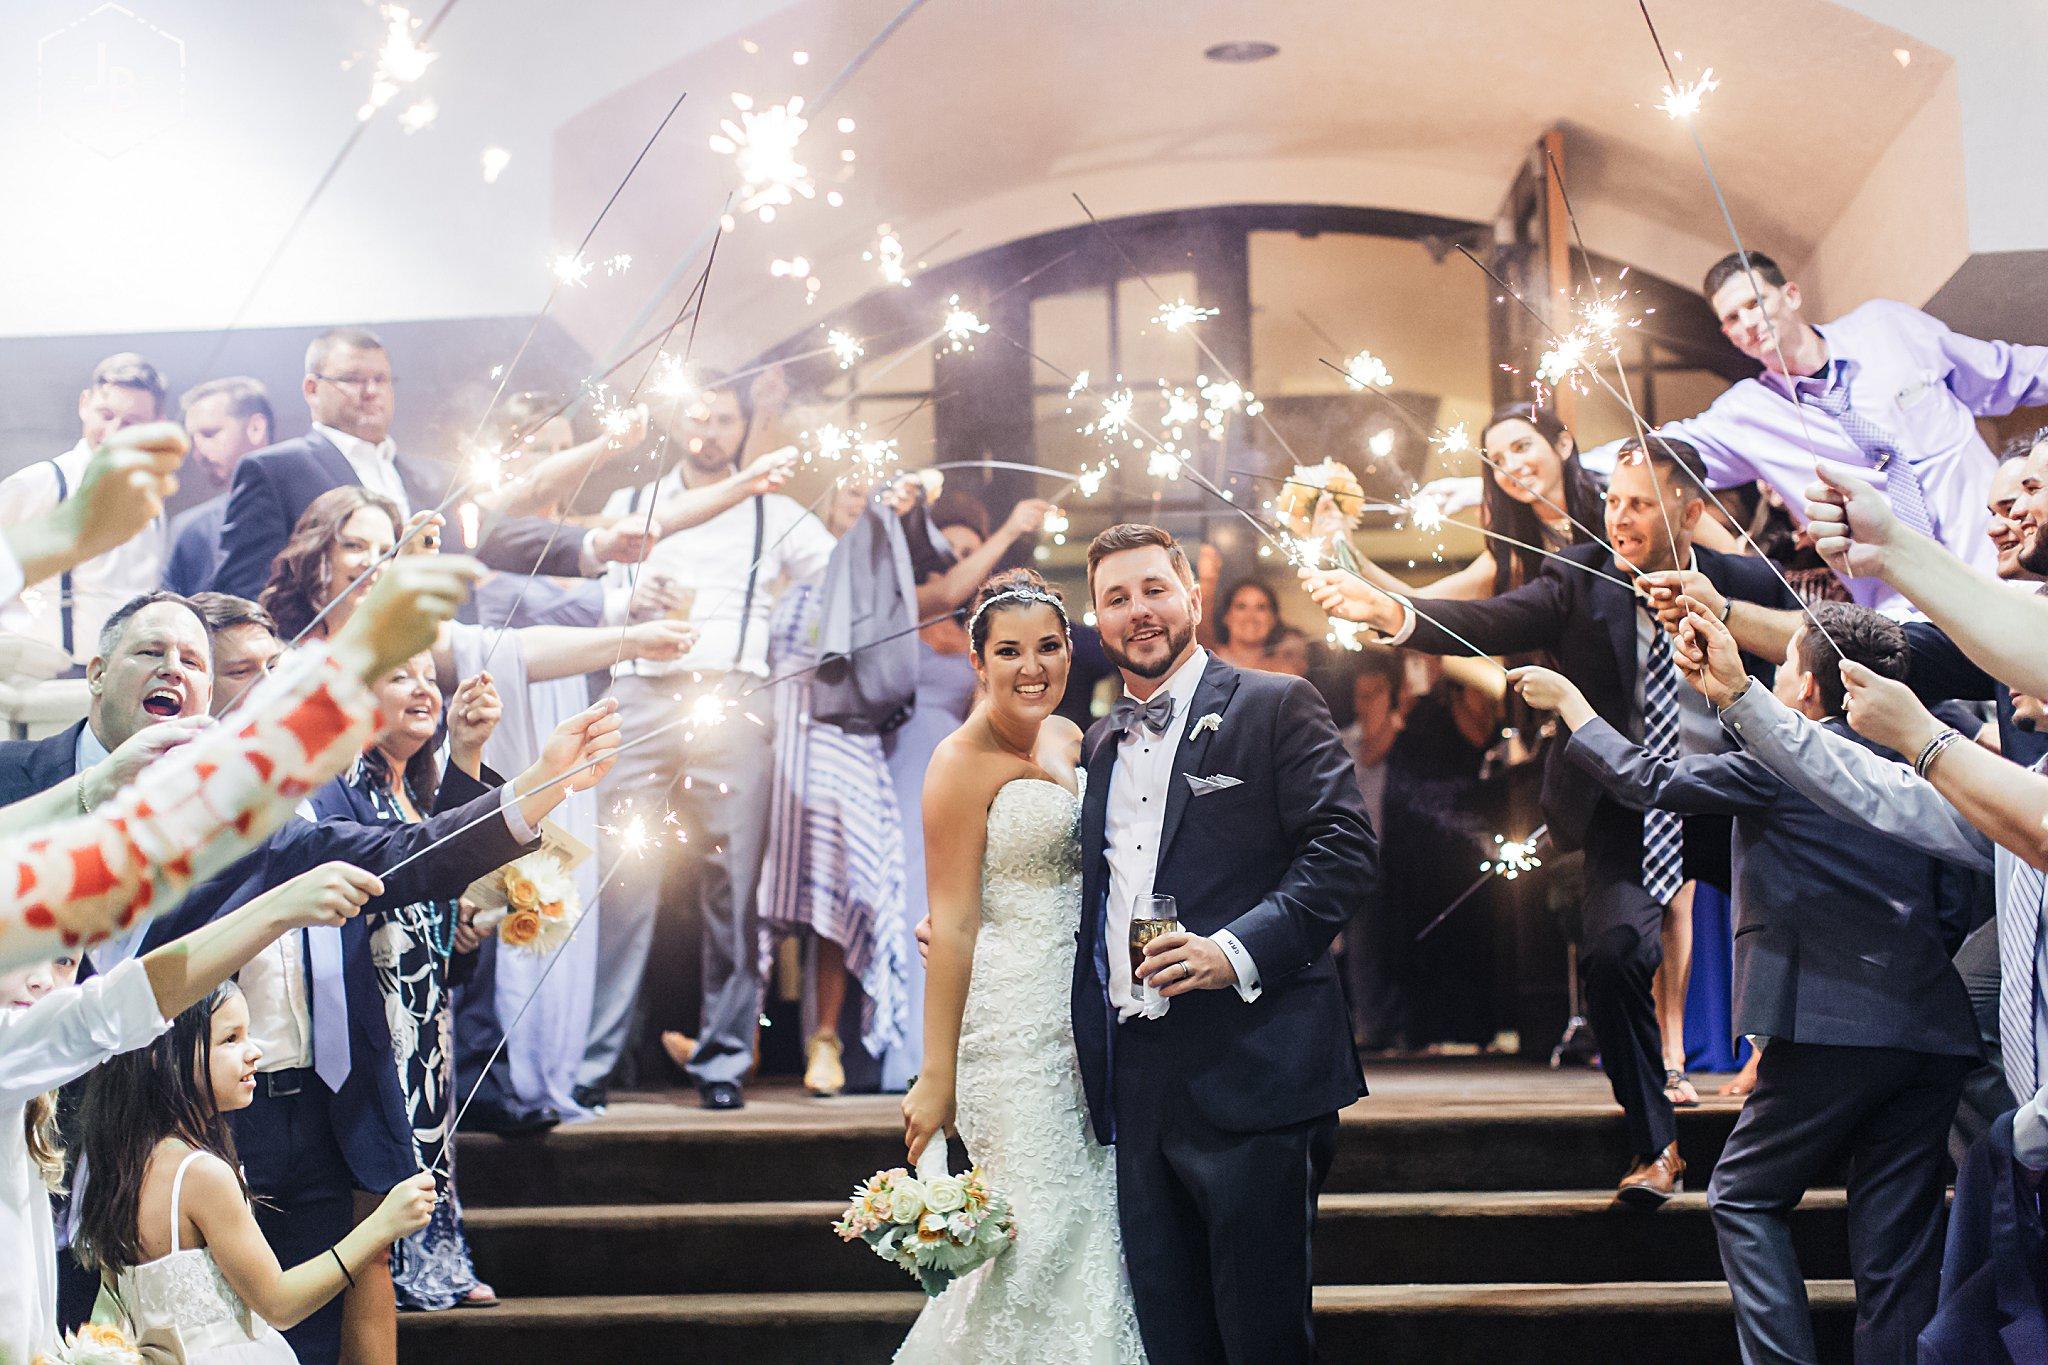 WeddingandEngagementFloridaPhotographer_2833.jpg